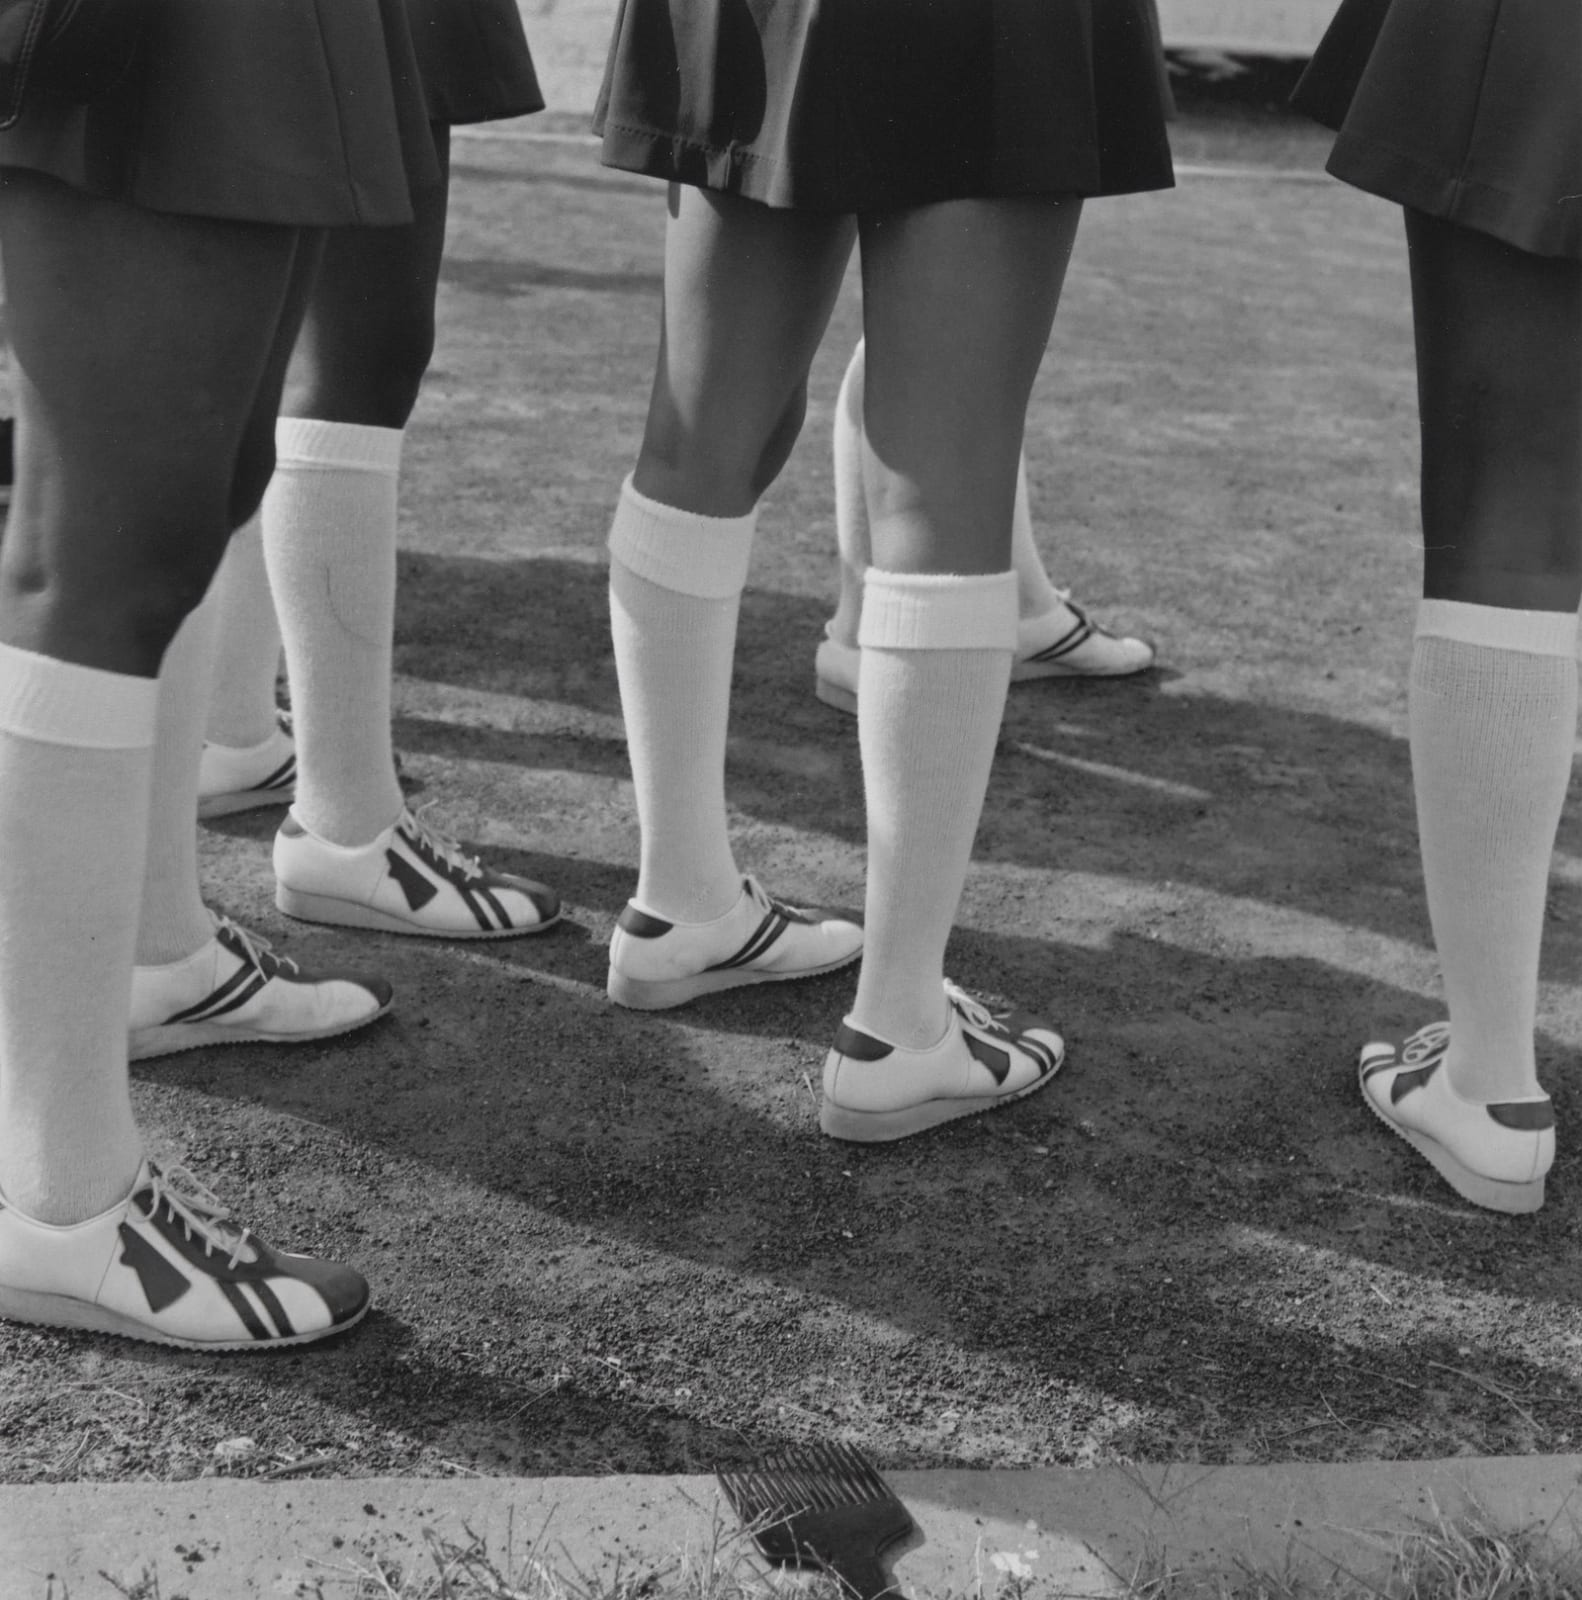 Steven Rifkin, Untitled, Kansas City, MO, 1976